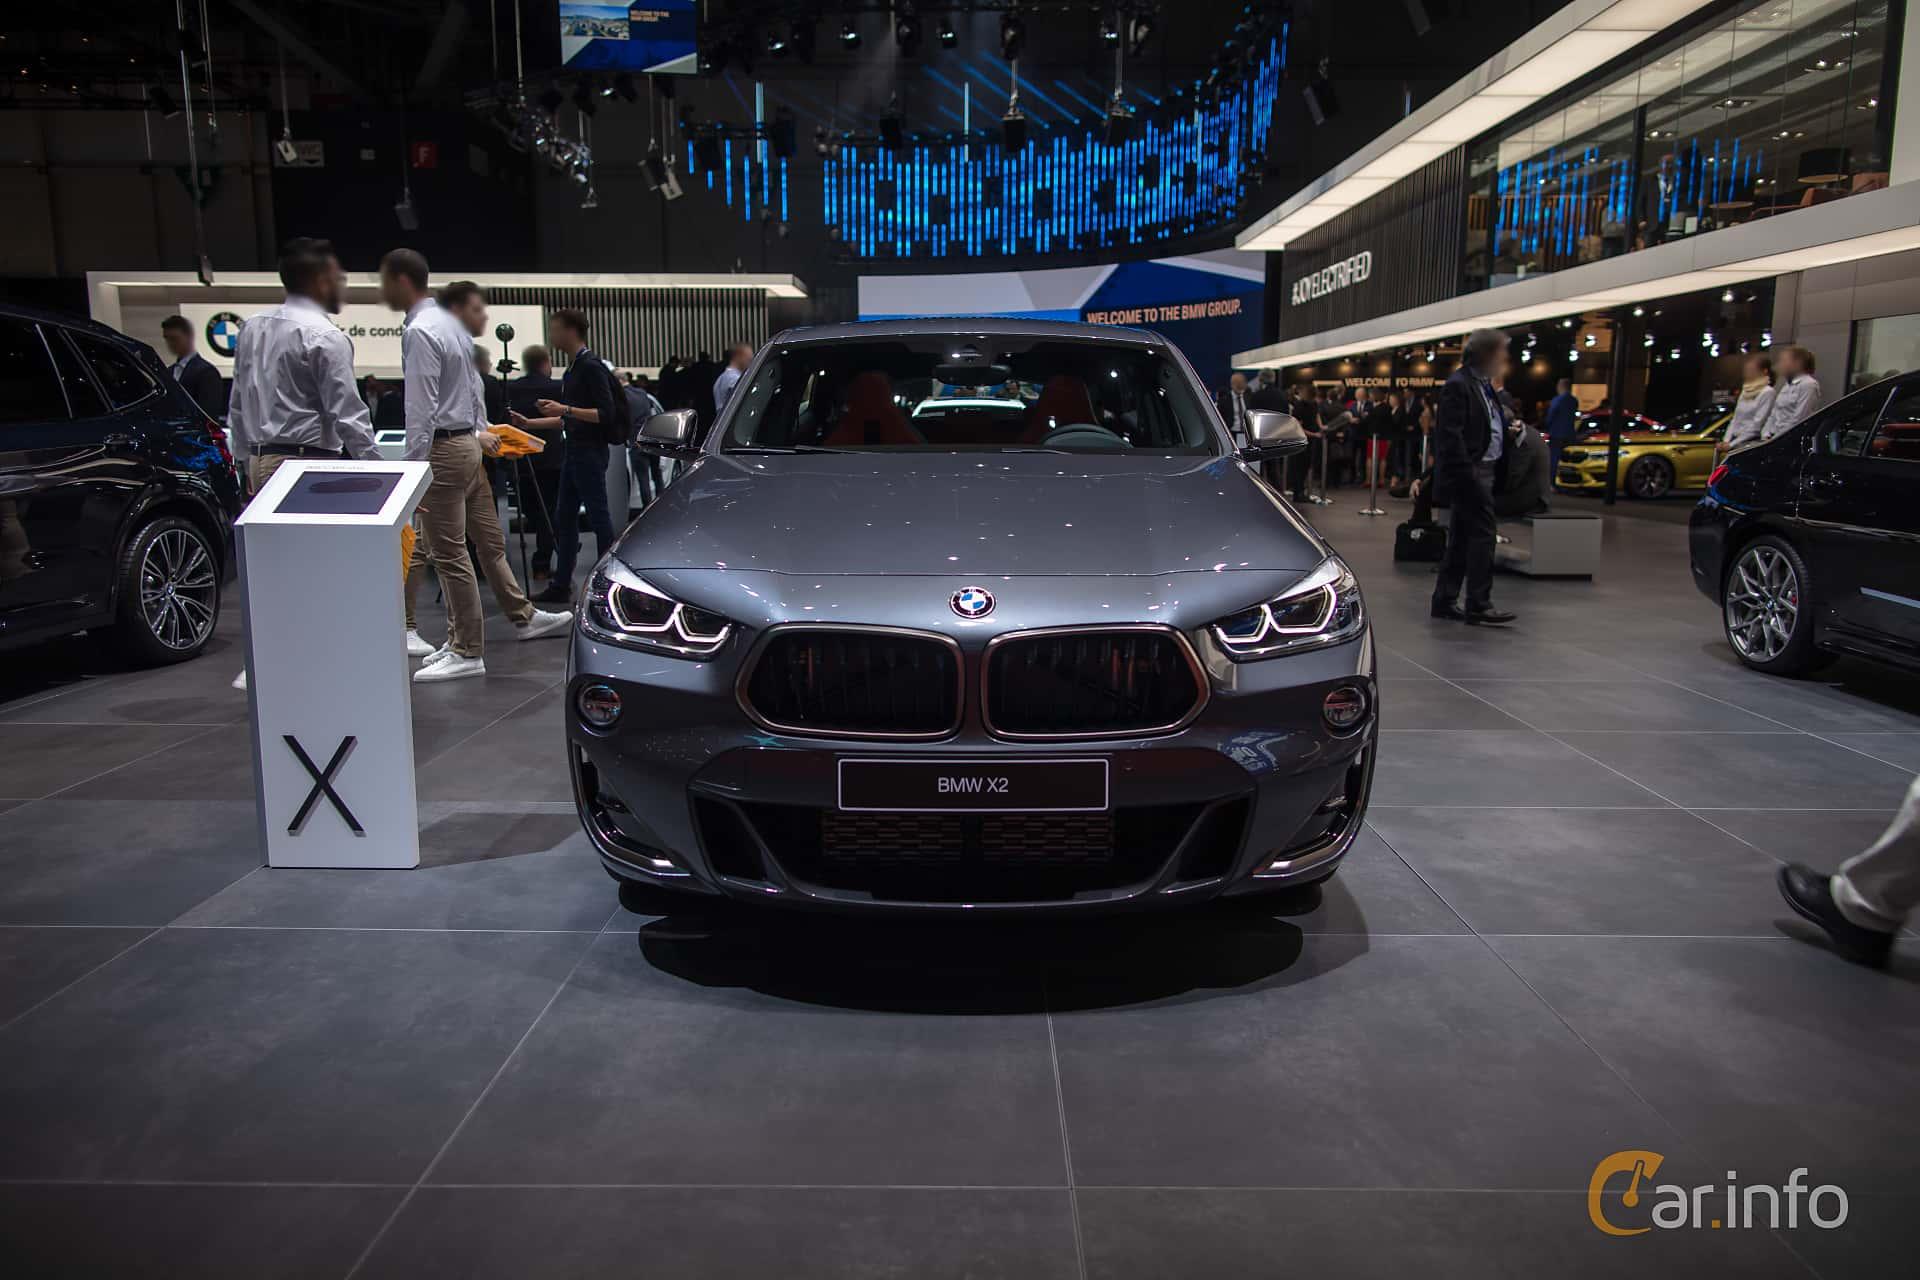 BMW X2 M35i  Steptronic, 306hp, 2019 at Geneva Motor Show 2019